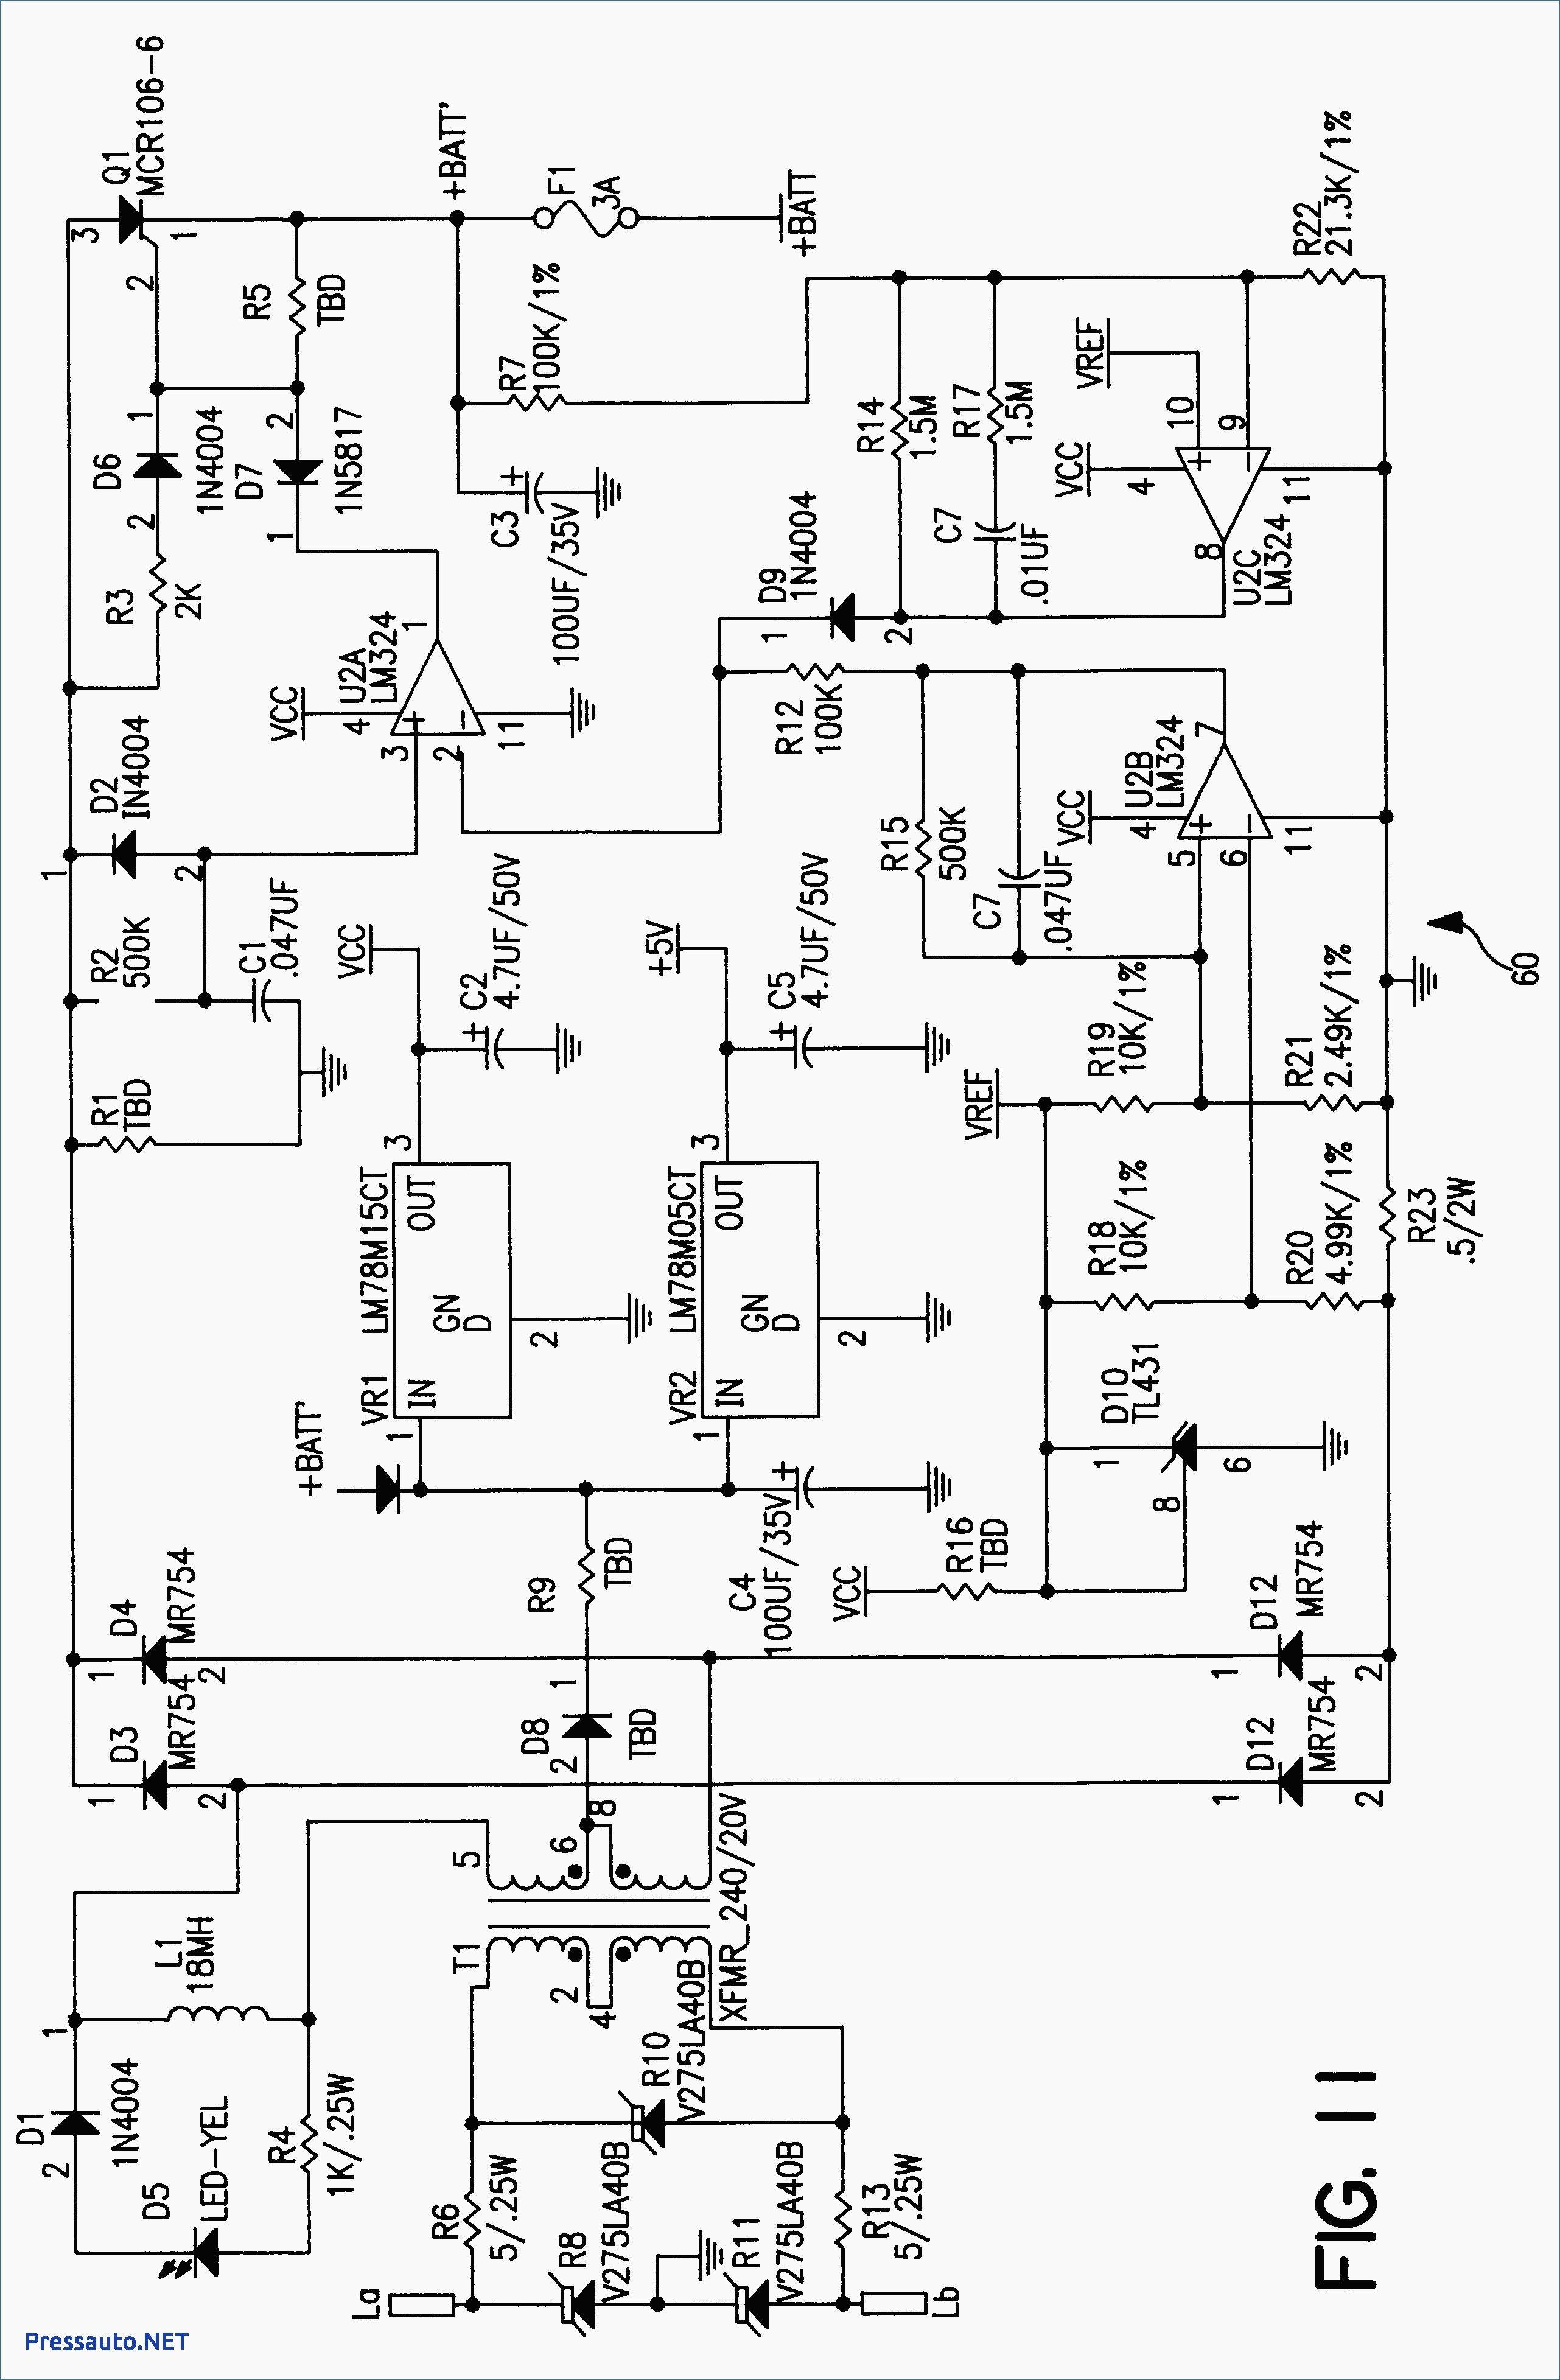 medium resolution of home generator transfer switch wiring diagram wiring diagram ideas generator fuel system diagram generator solenoid diagram